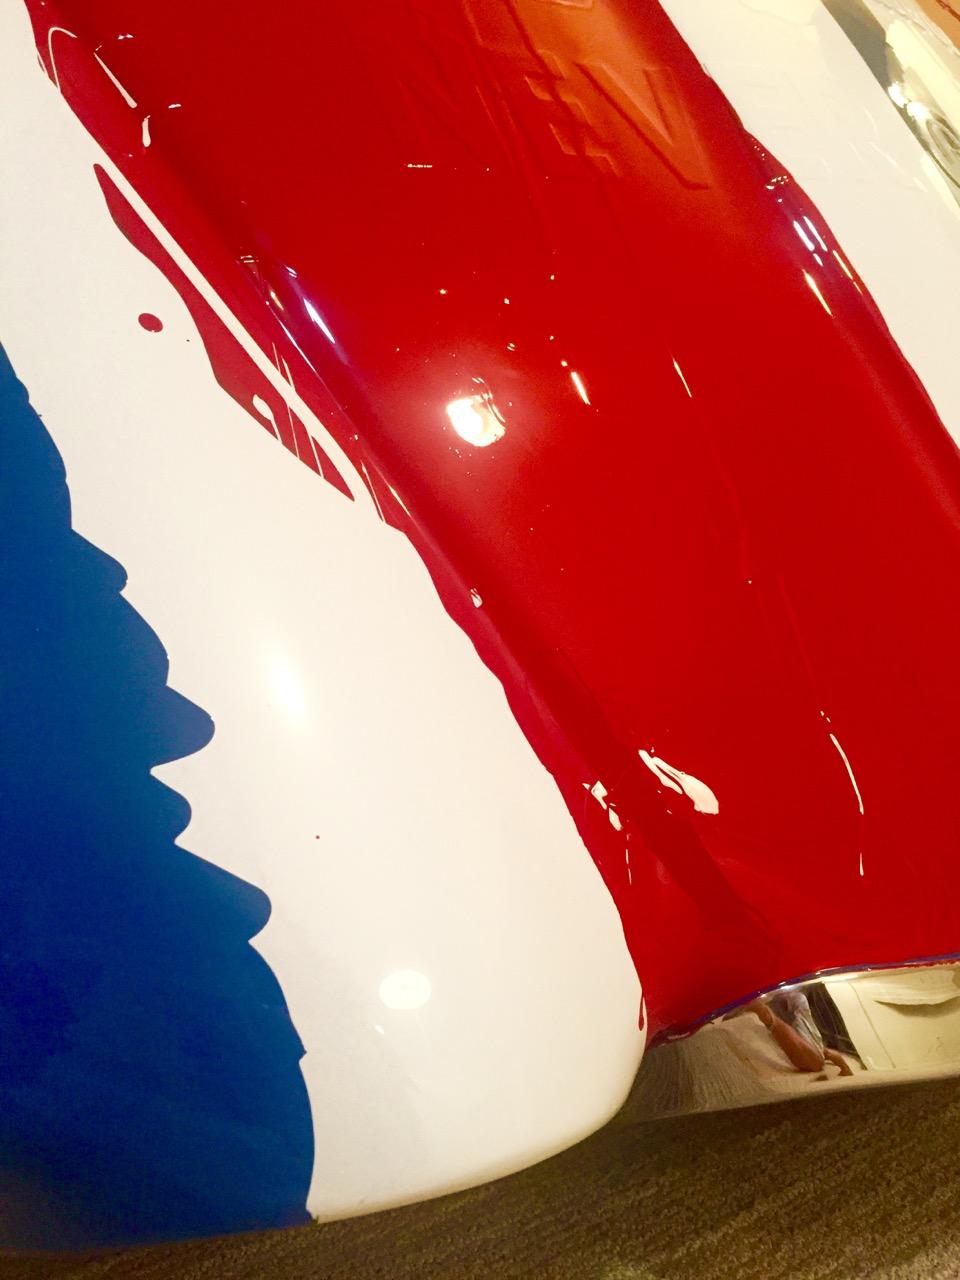 scott hughes art never give in jaguar hood british flag ferrari paint scheme